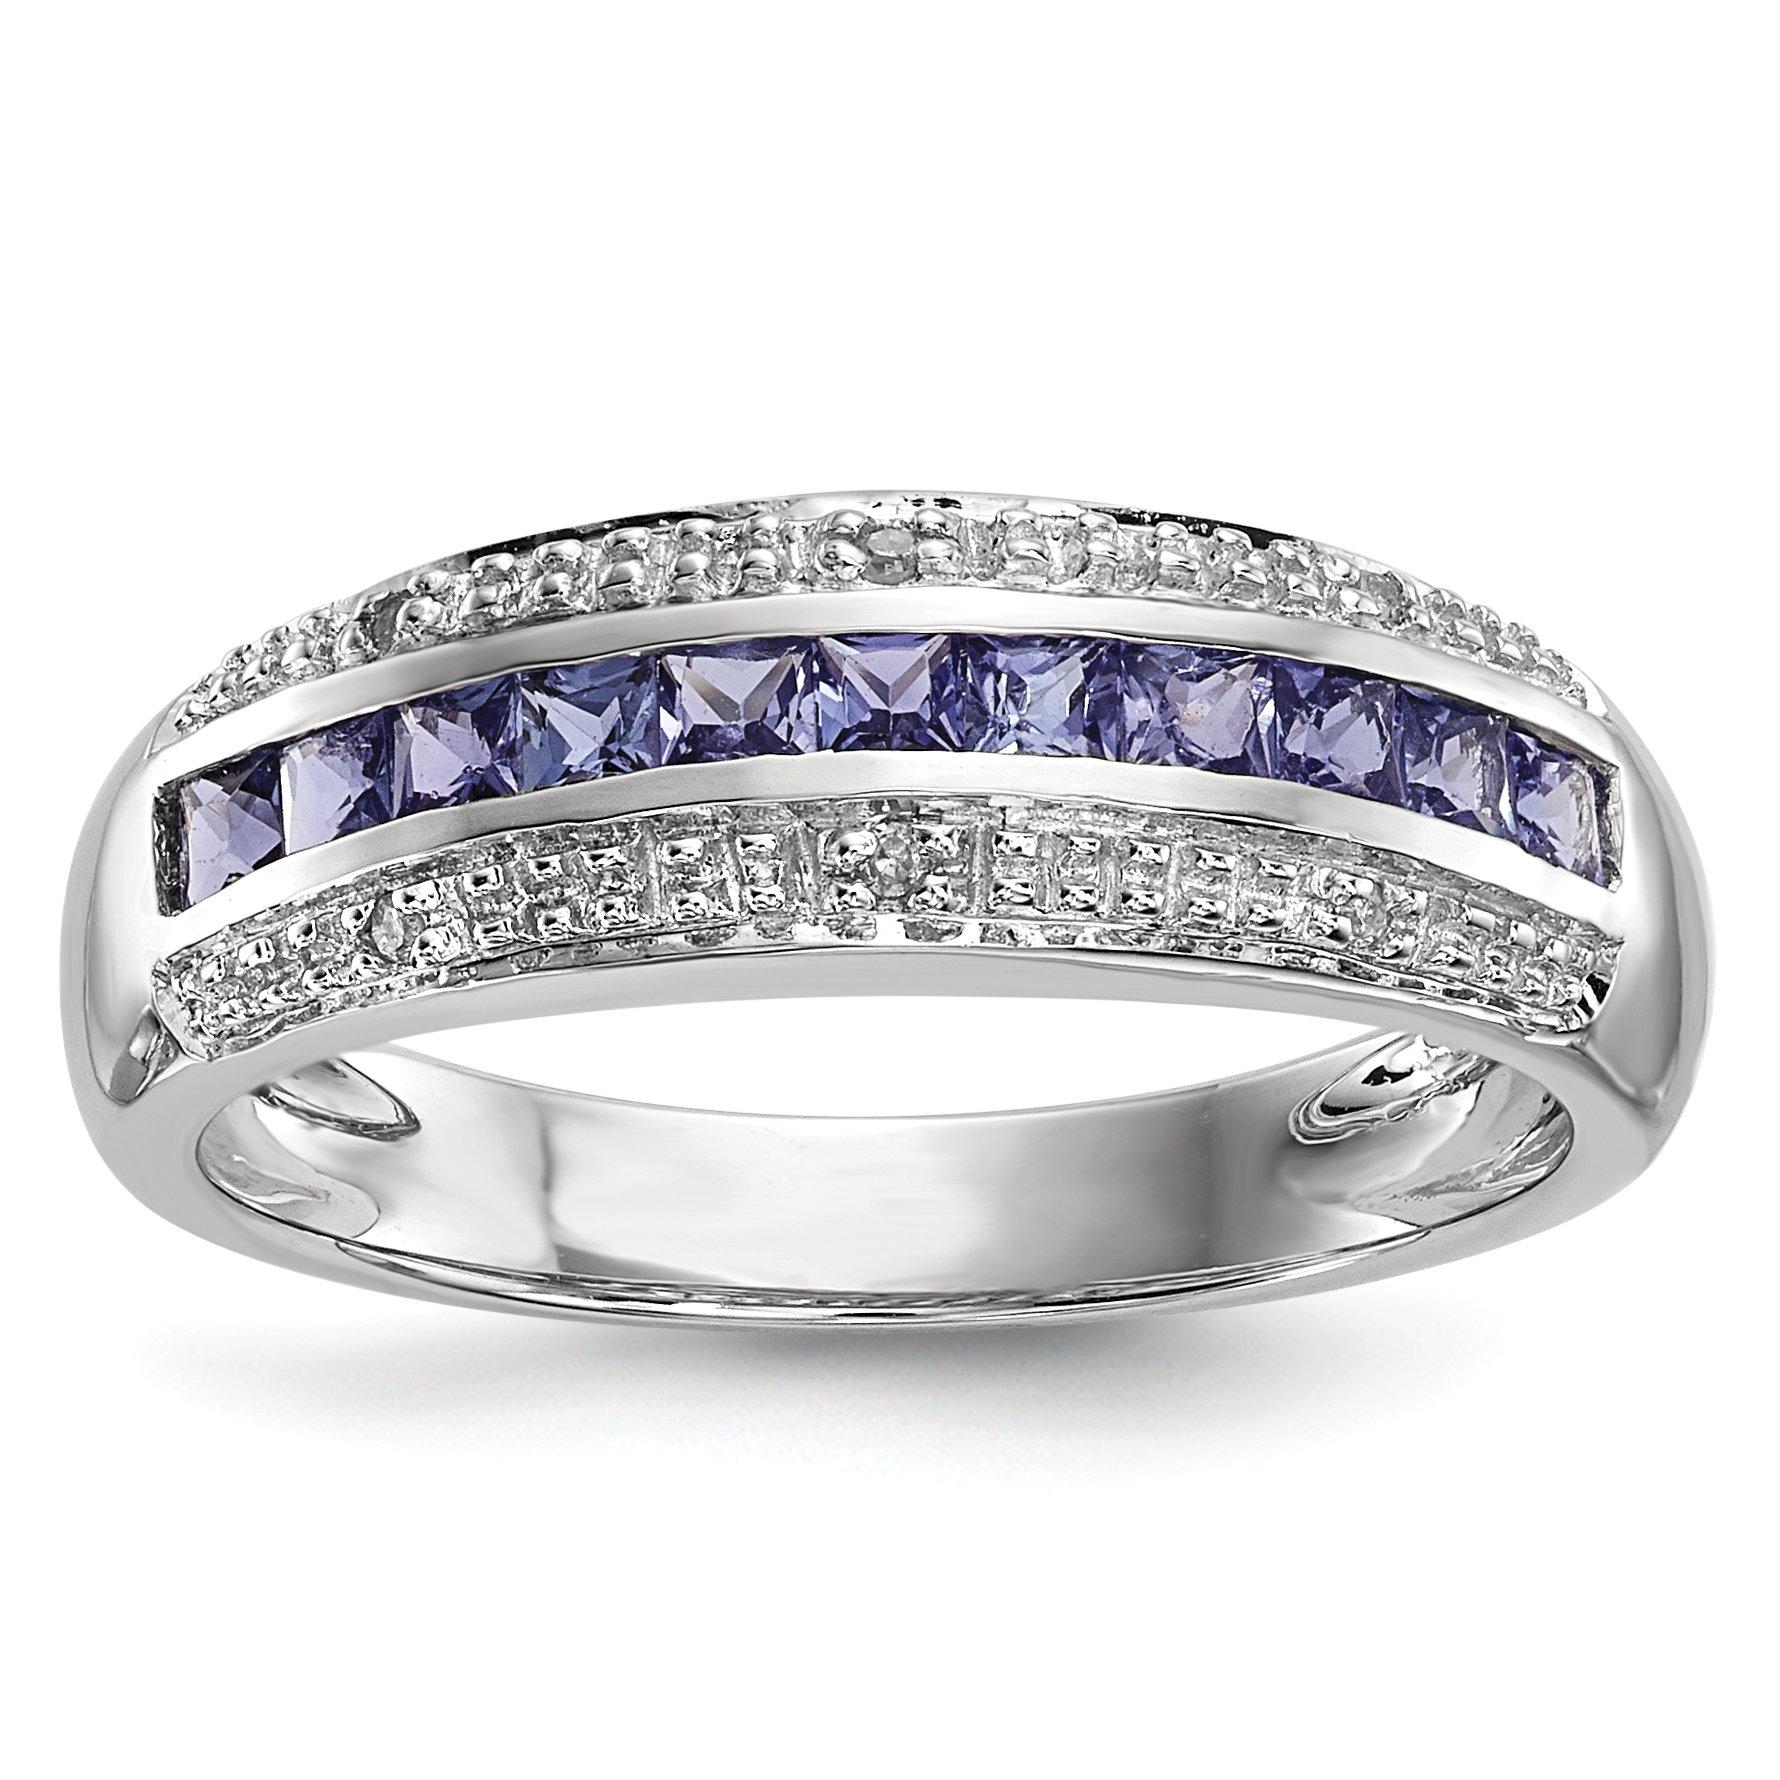 ICE CARATS 14k White Gold Diamond Blue Tanzanite Band Ring Size 7.00 Gemstone Fine Jewelry Gift Set For Women Heart